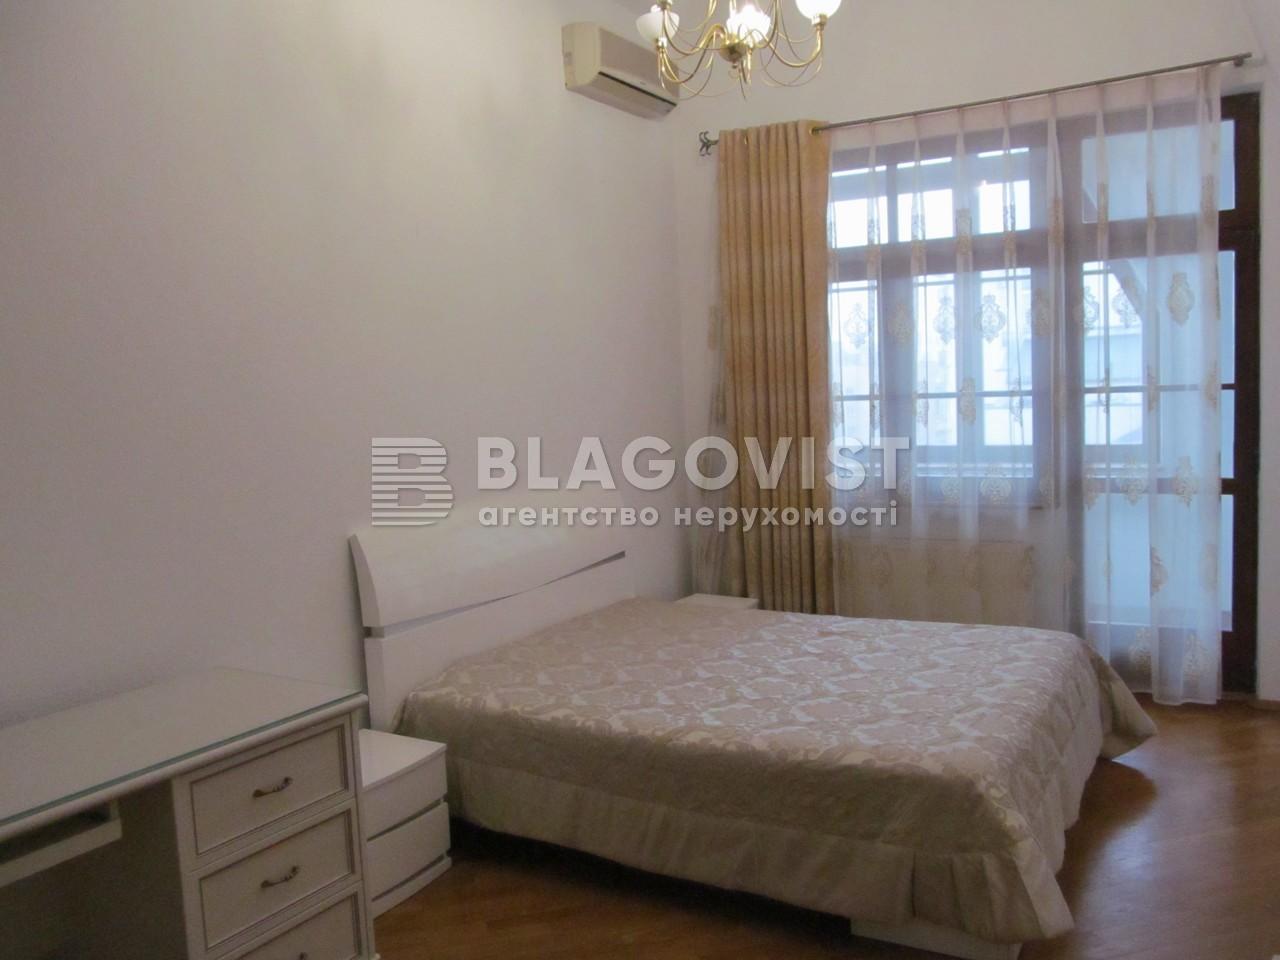 Квартира C-72808, Павловская, 18, Киев - Фото 20